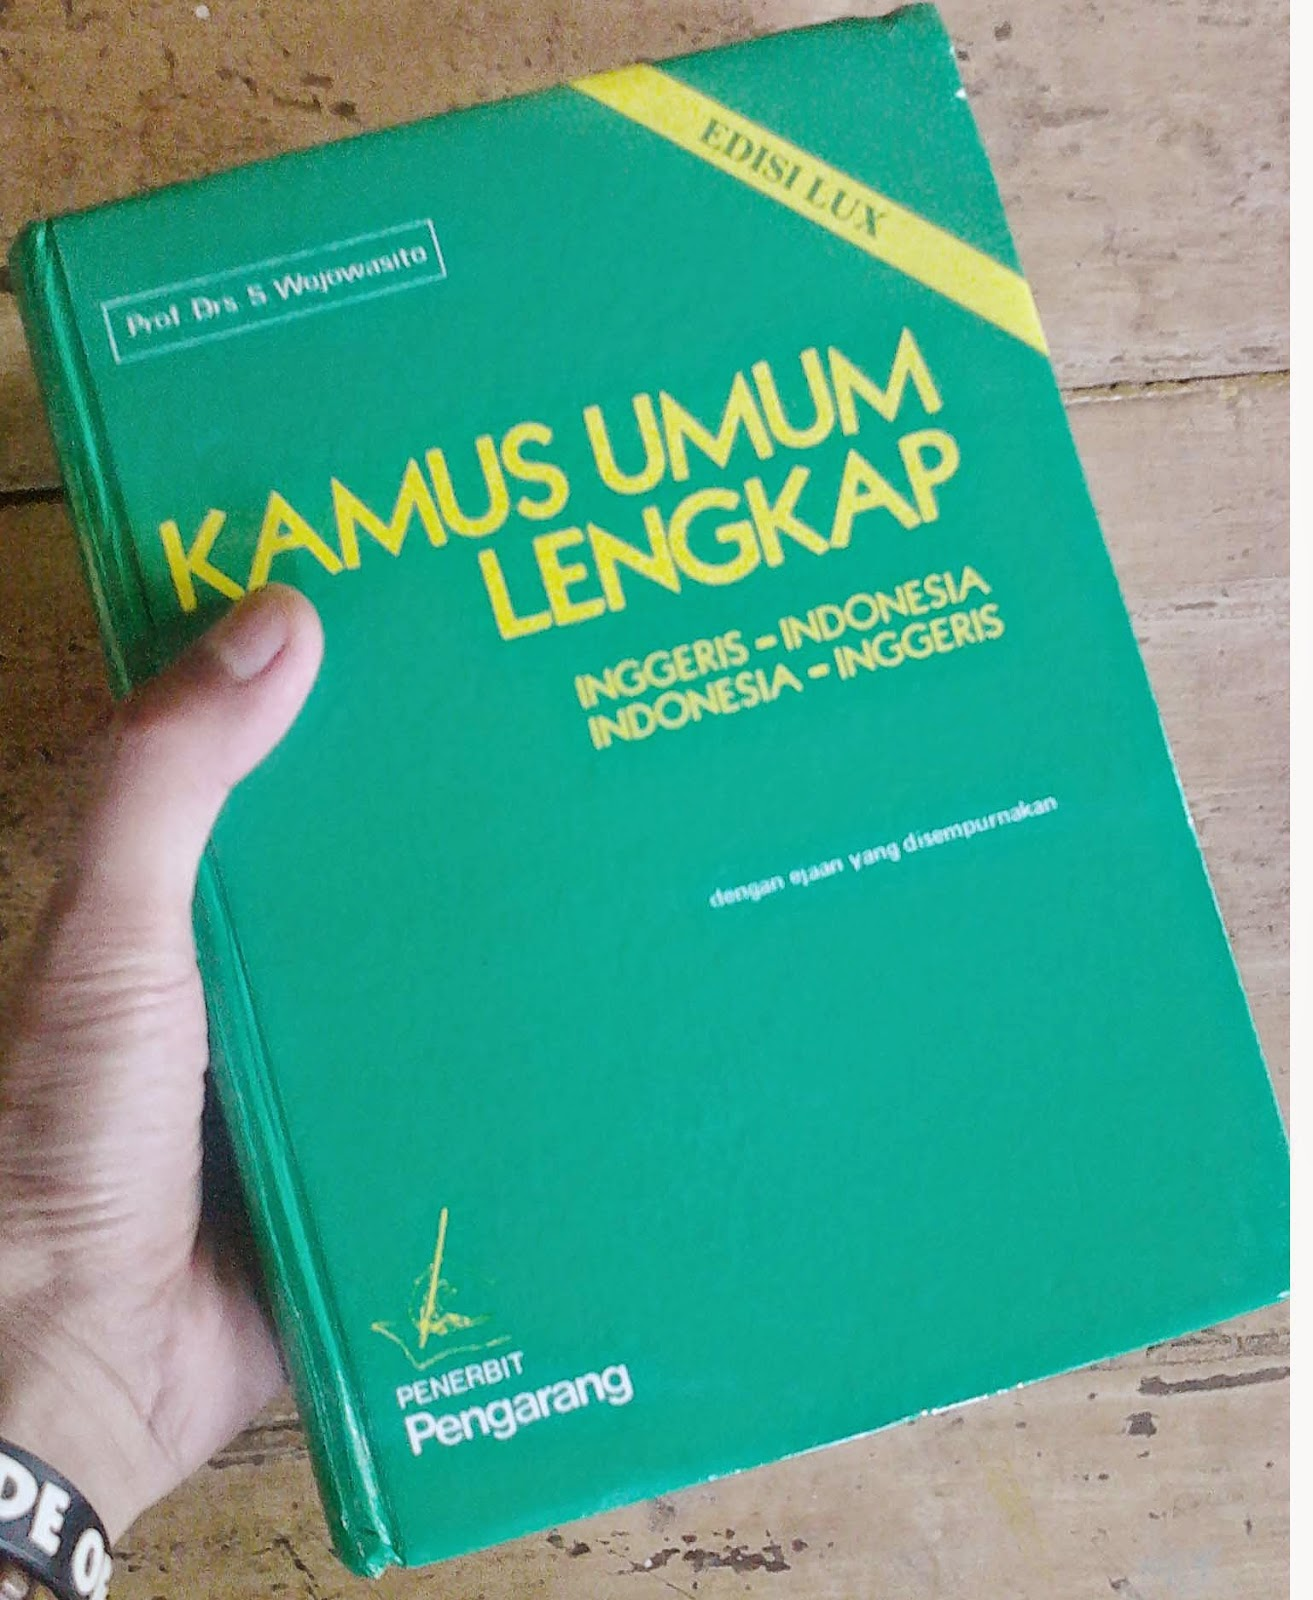 Inilah kamus bahasa inggris terbaik yang wajib kamu punya kamus bahasa inggris lengkap belajar bahasa inggris kamus wojowasito stopboris Choice Image